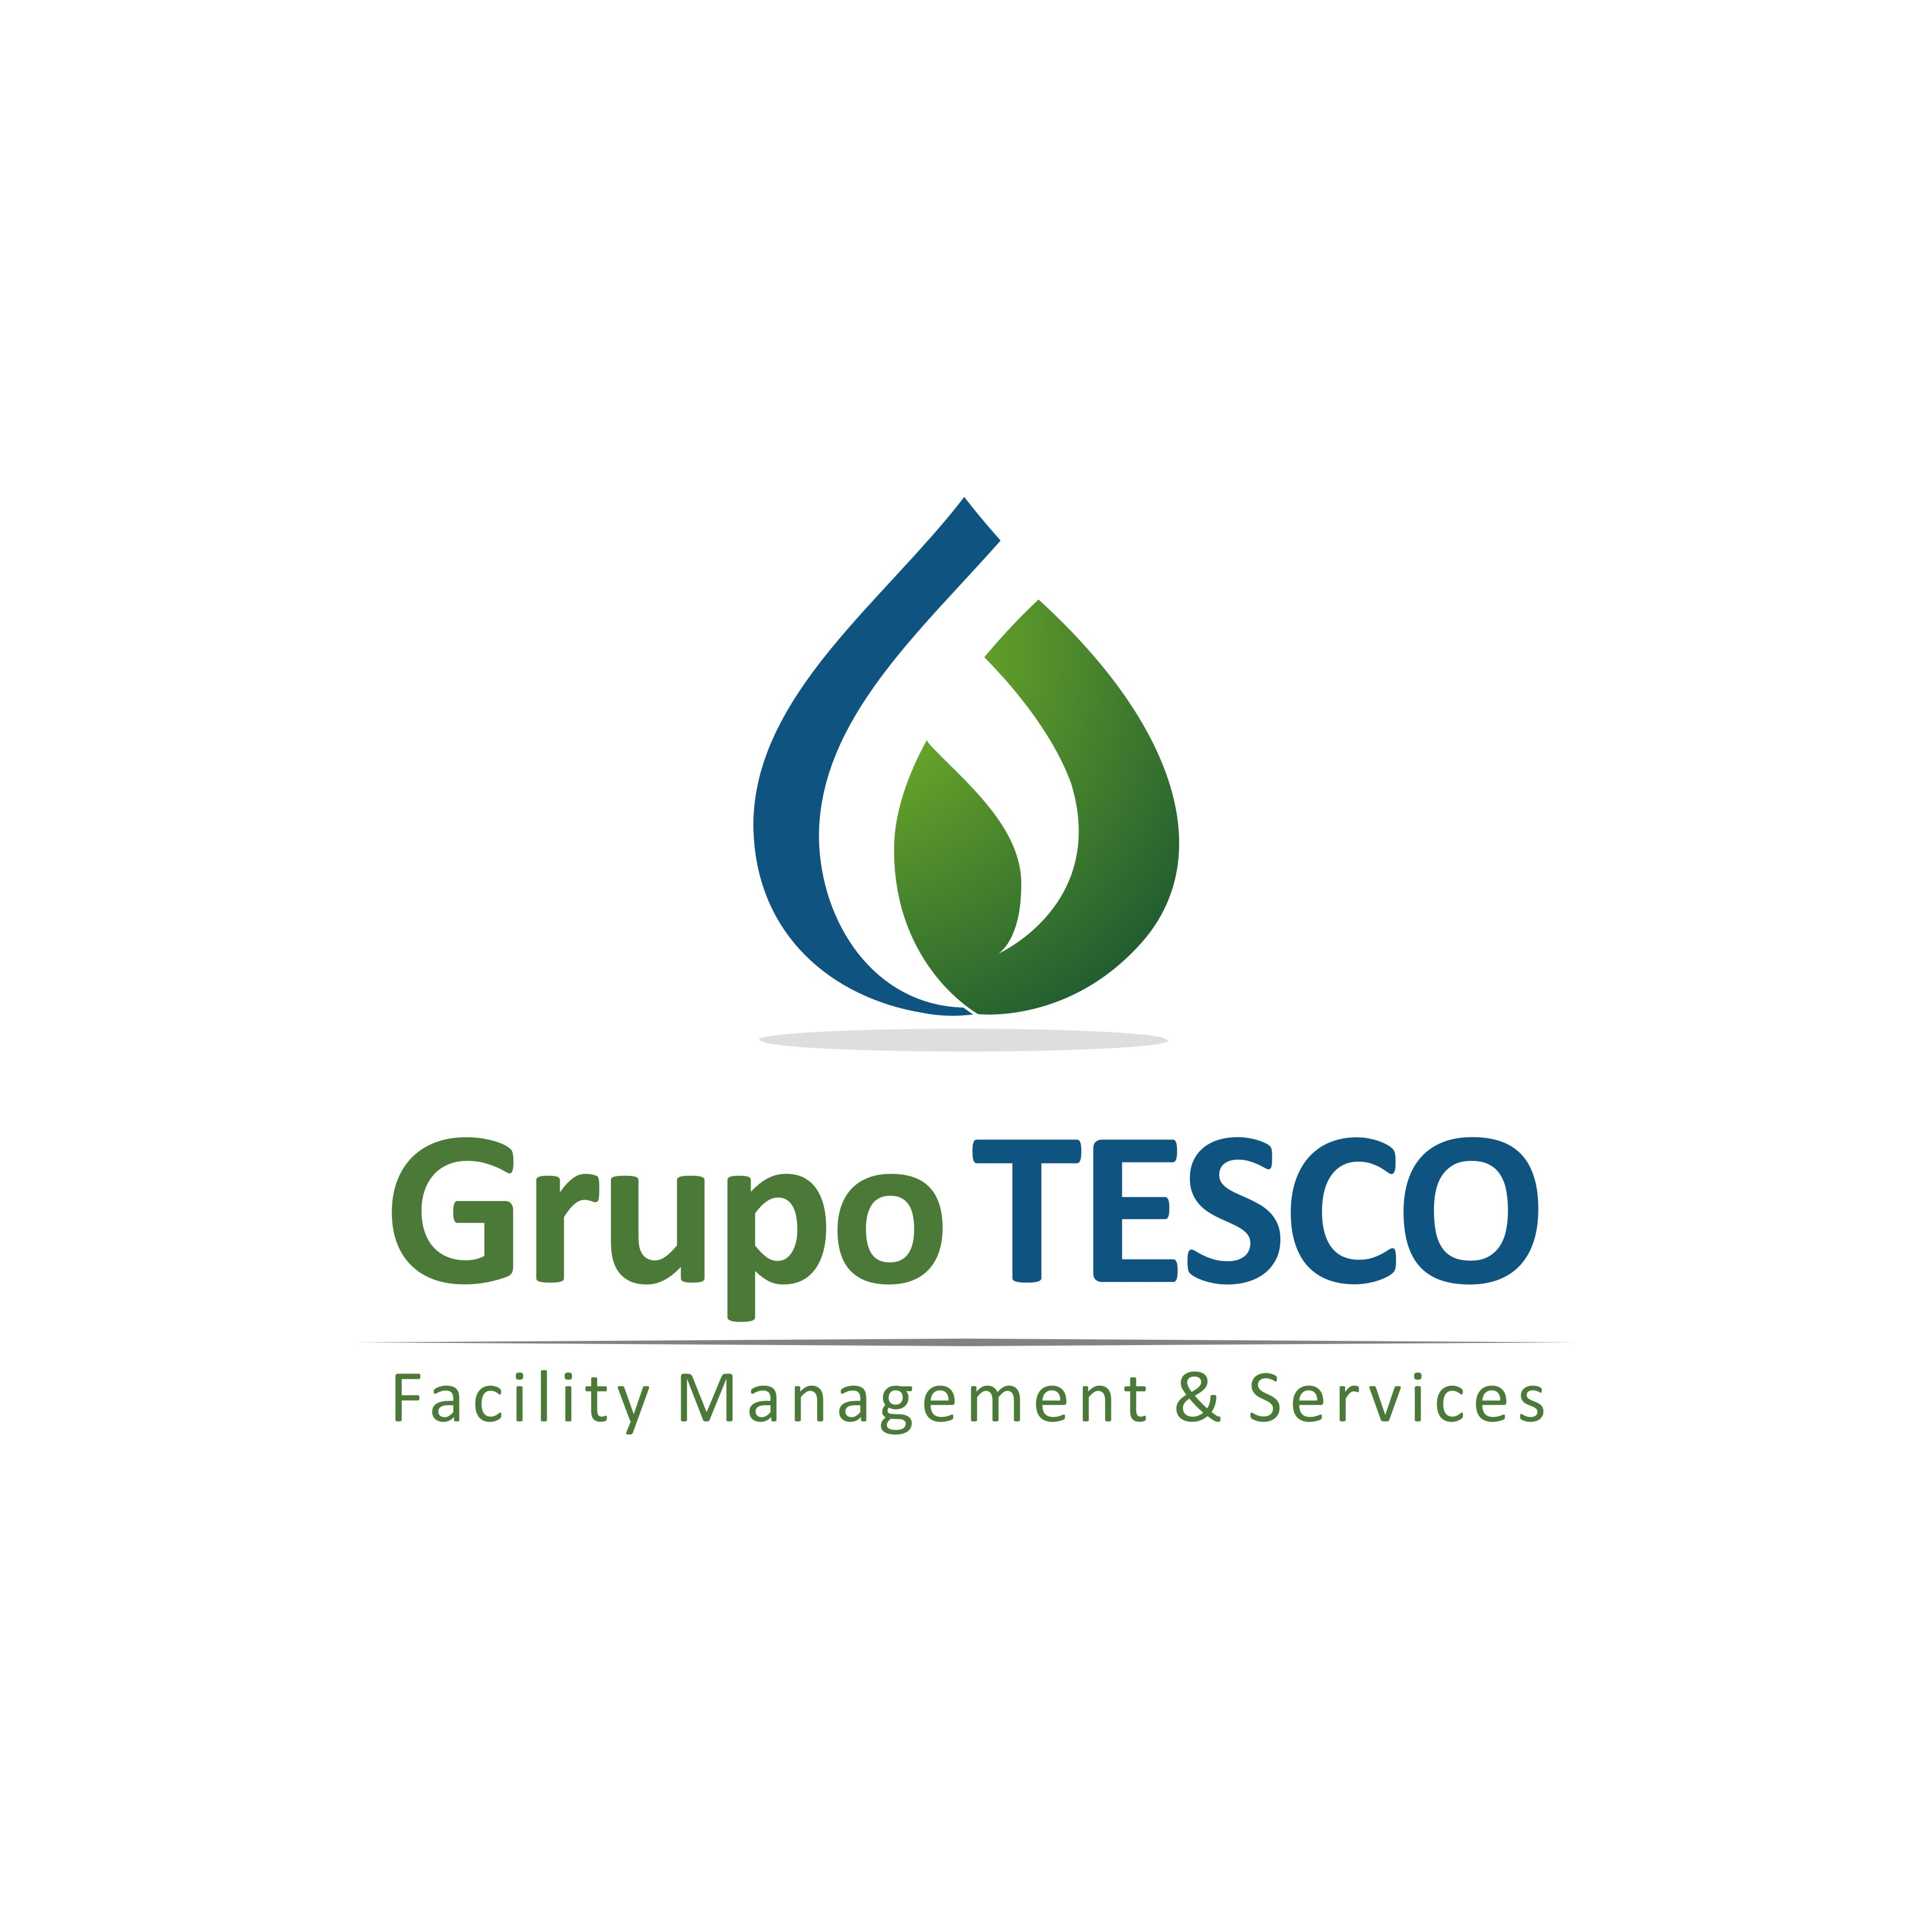 Grupo Tesco Facility Management & Services